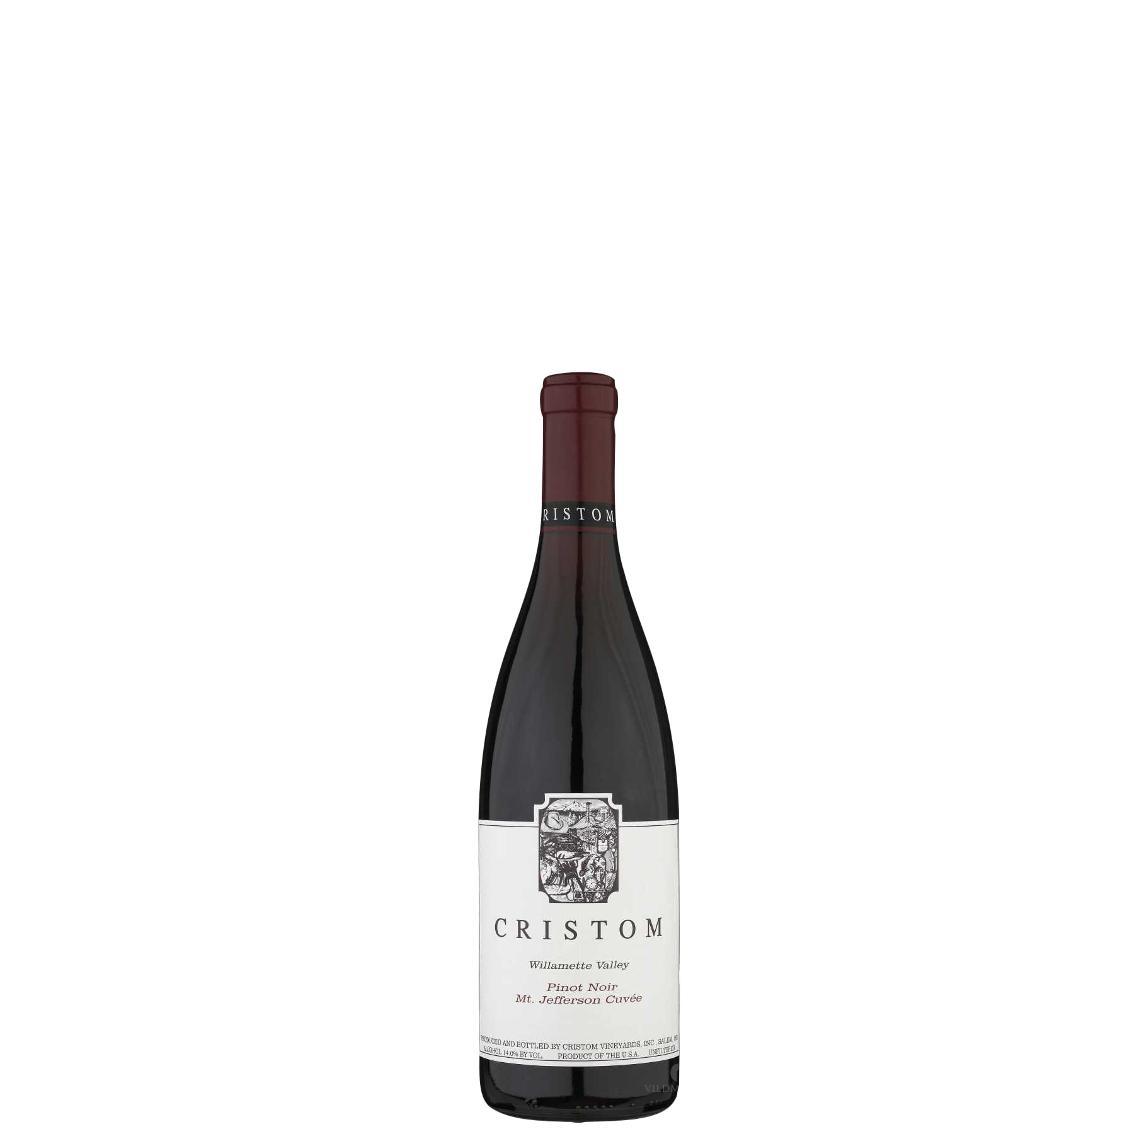 "1/2 fl. (37,5 cl.) 2018 Cristom Pinot Noir ""Mt. Jefferson Cuvee"" - Willamette Valley Oregon"